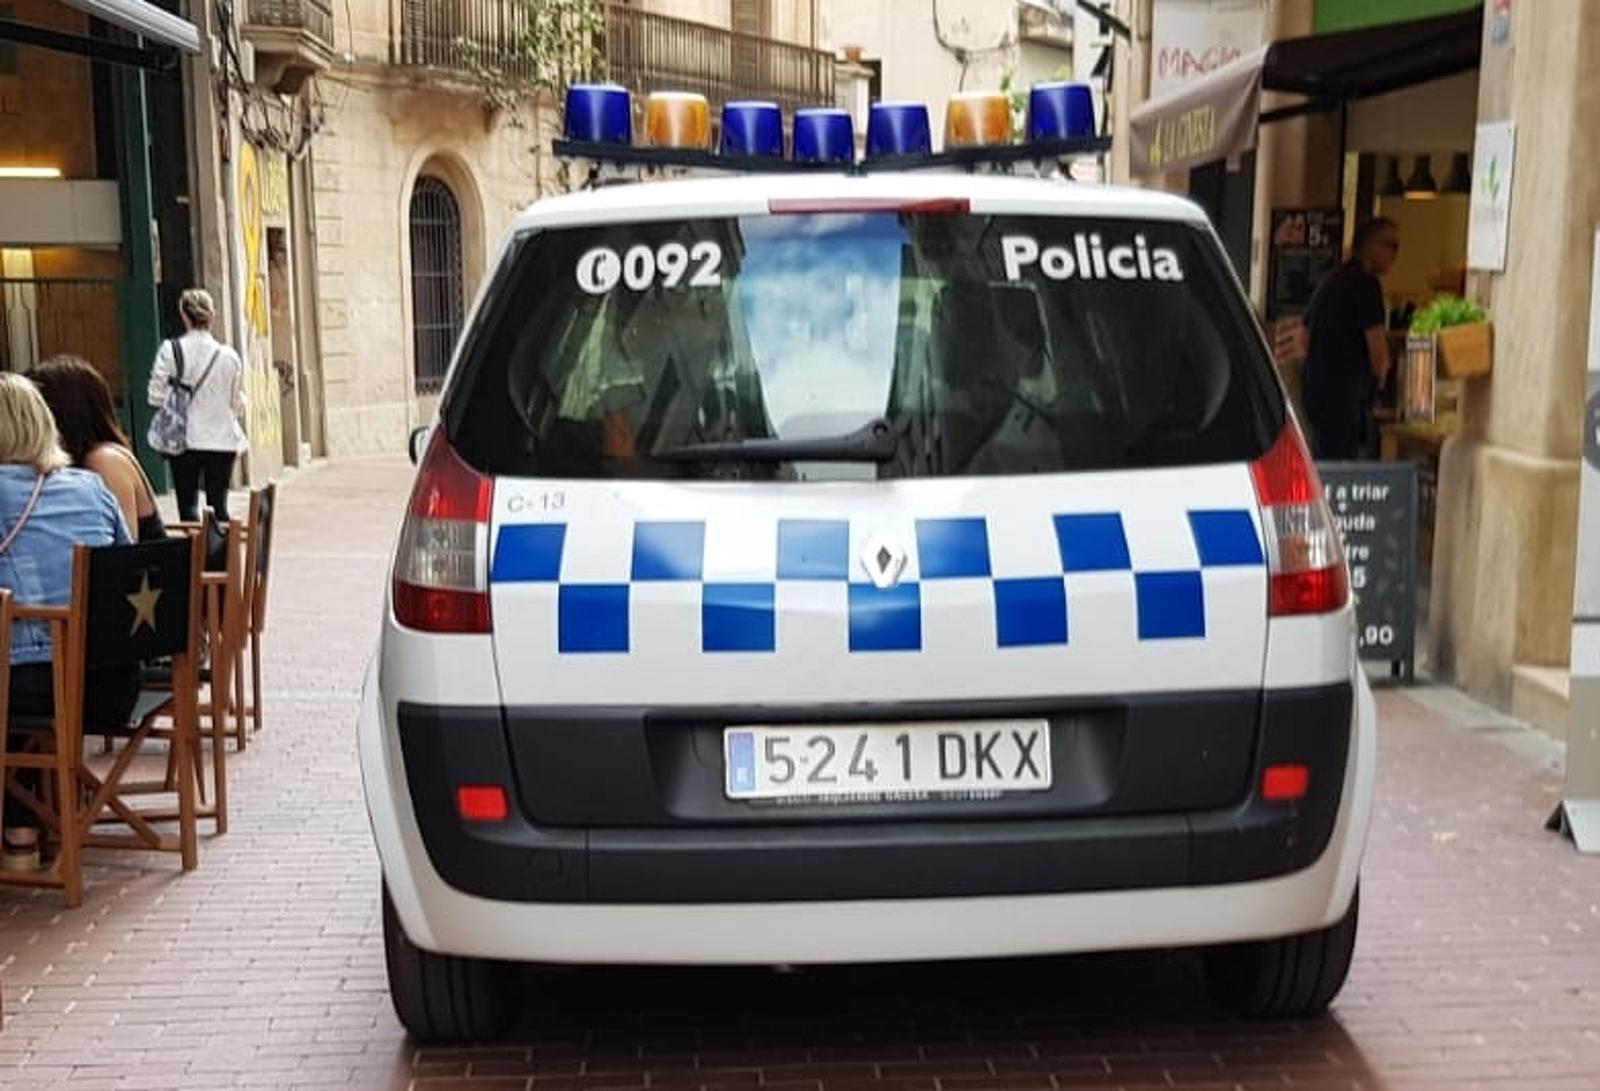 Cotxe de la policia municipal de Terrassa